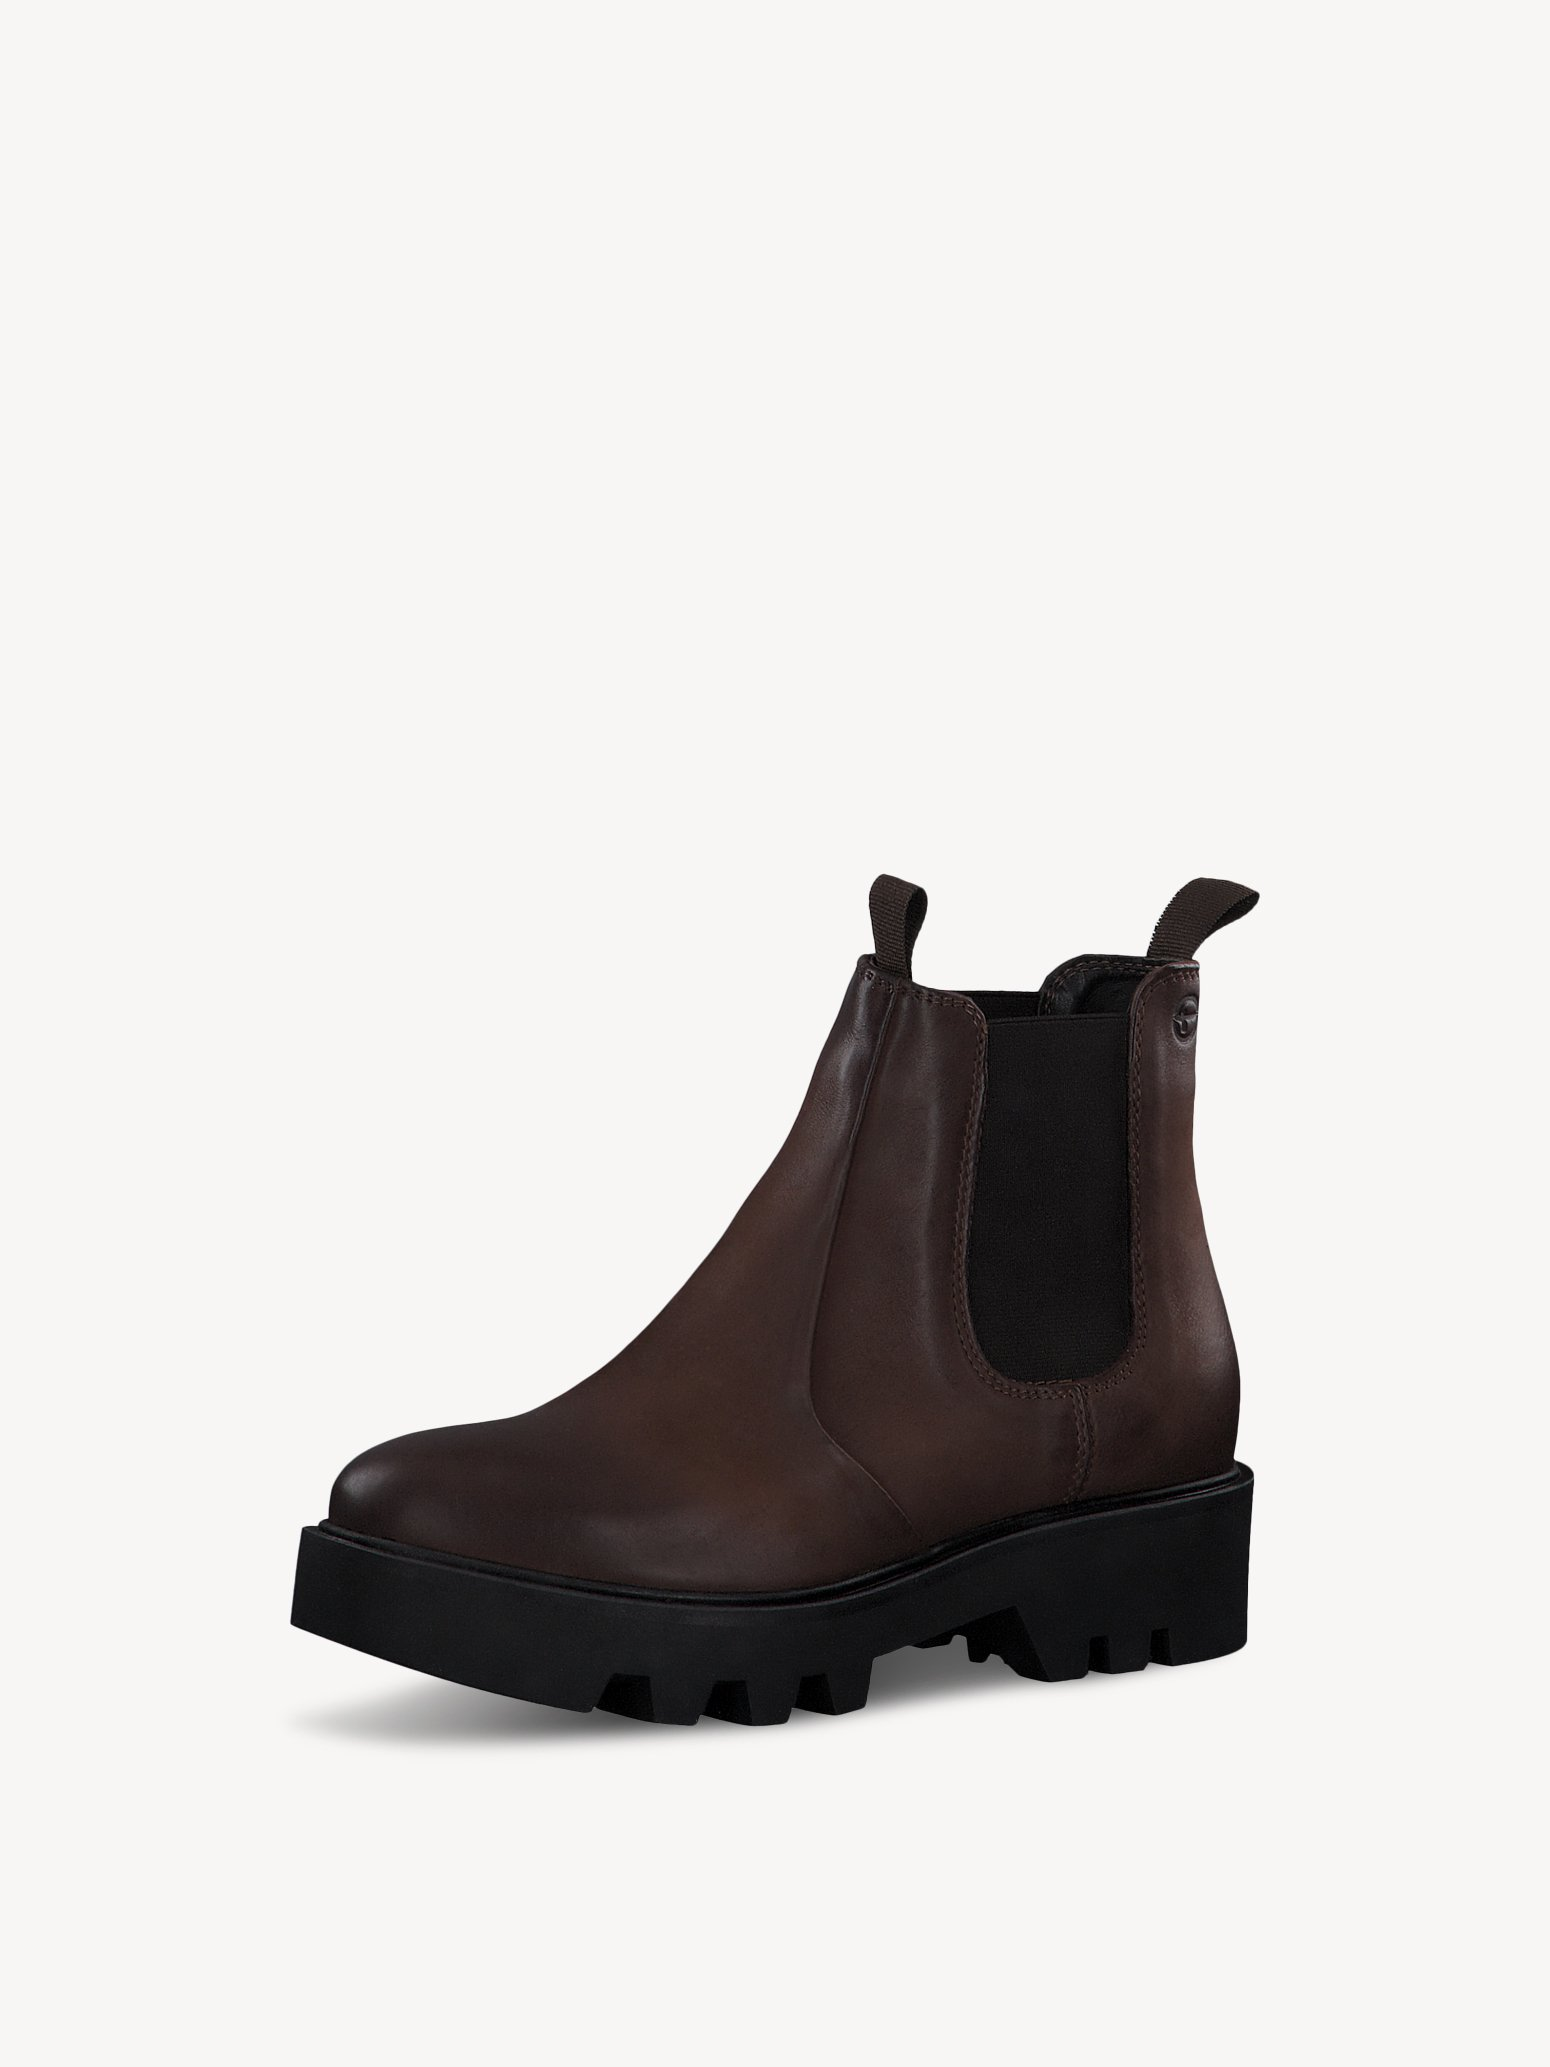 Ботинки Tamaris 1-1-25465-27-456